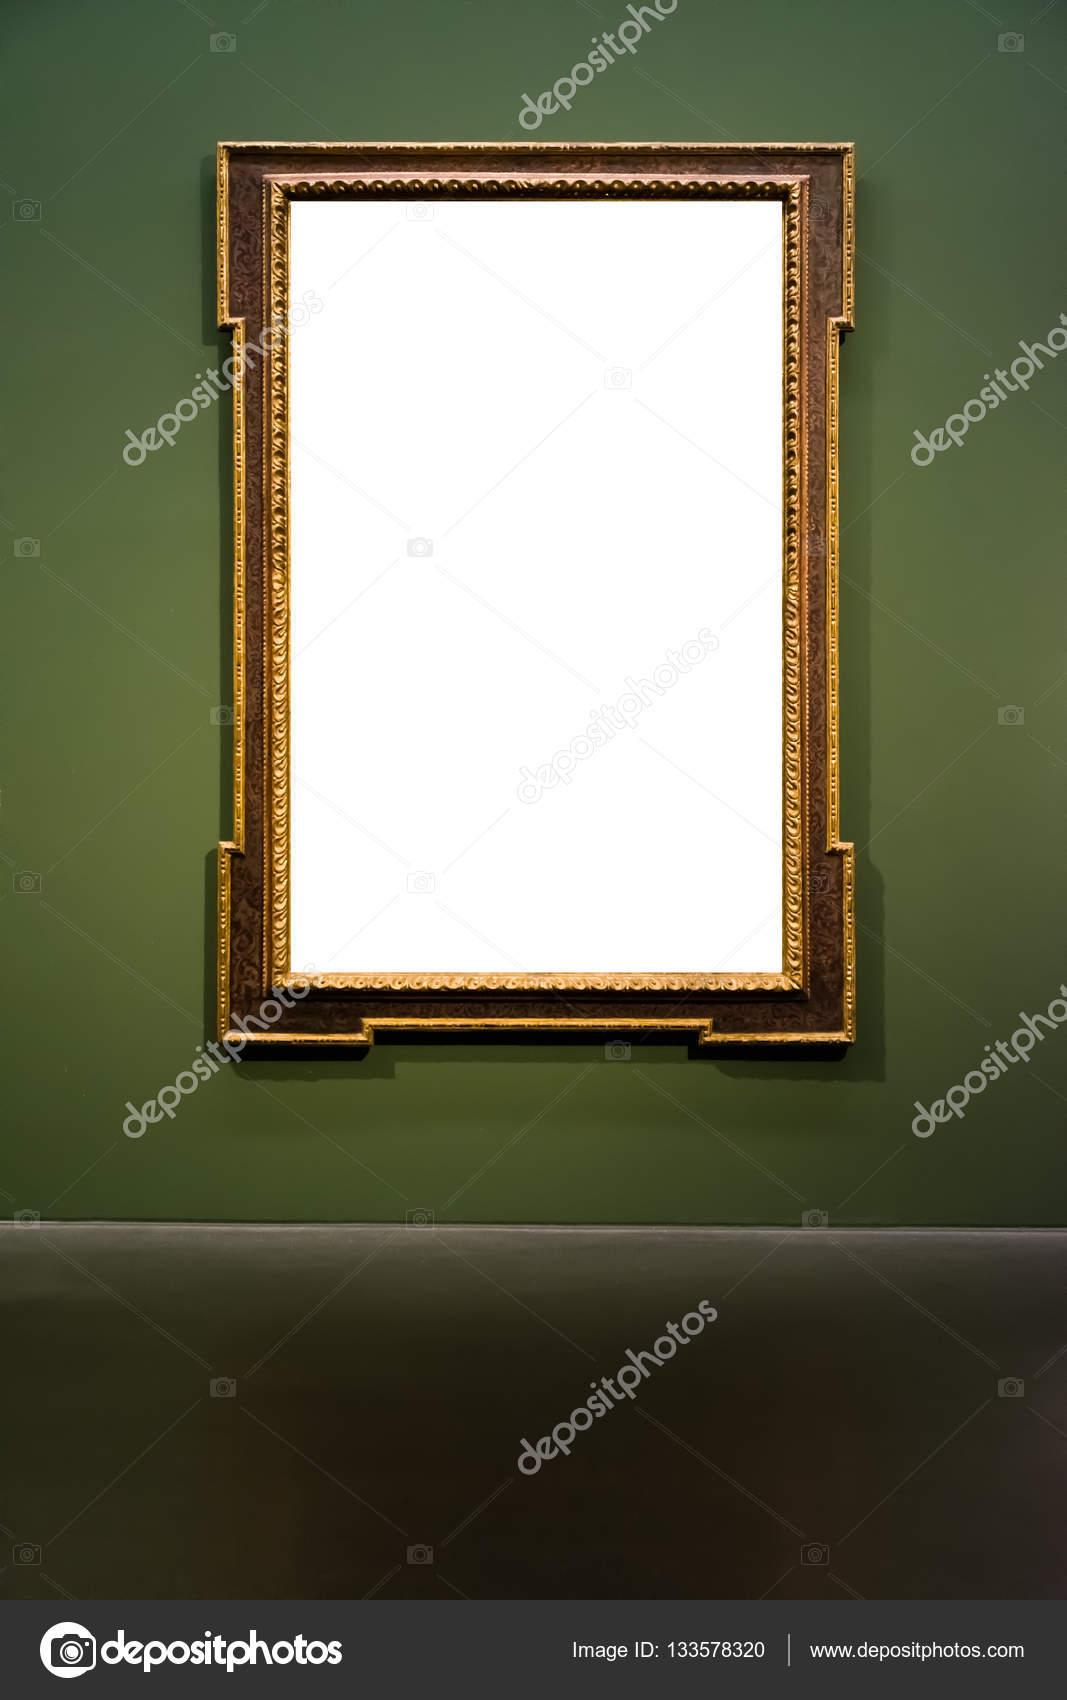 Kunstmuseum Rahmen dunkel grüne Wand verzierten Design weiß isoliert ...